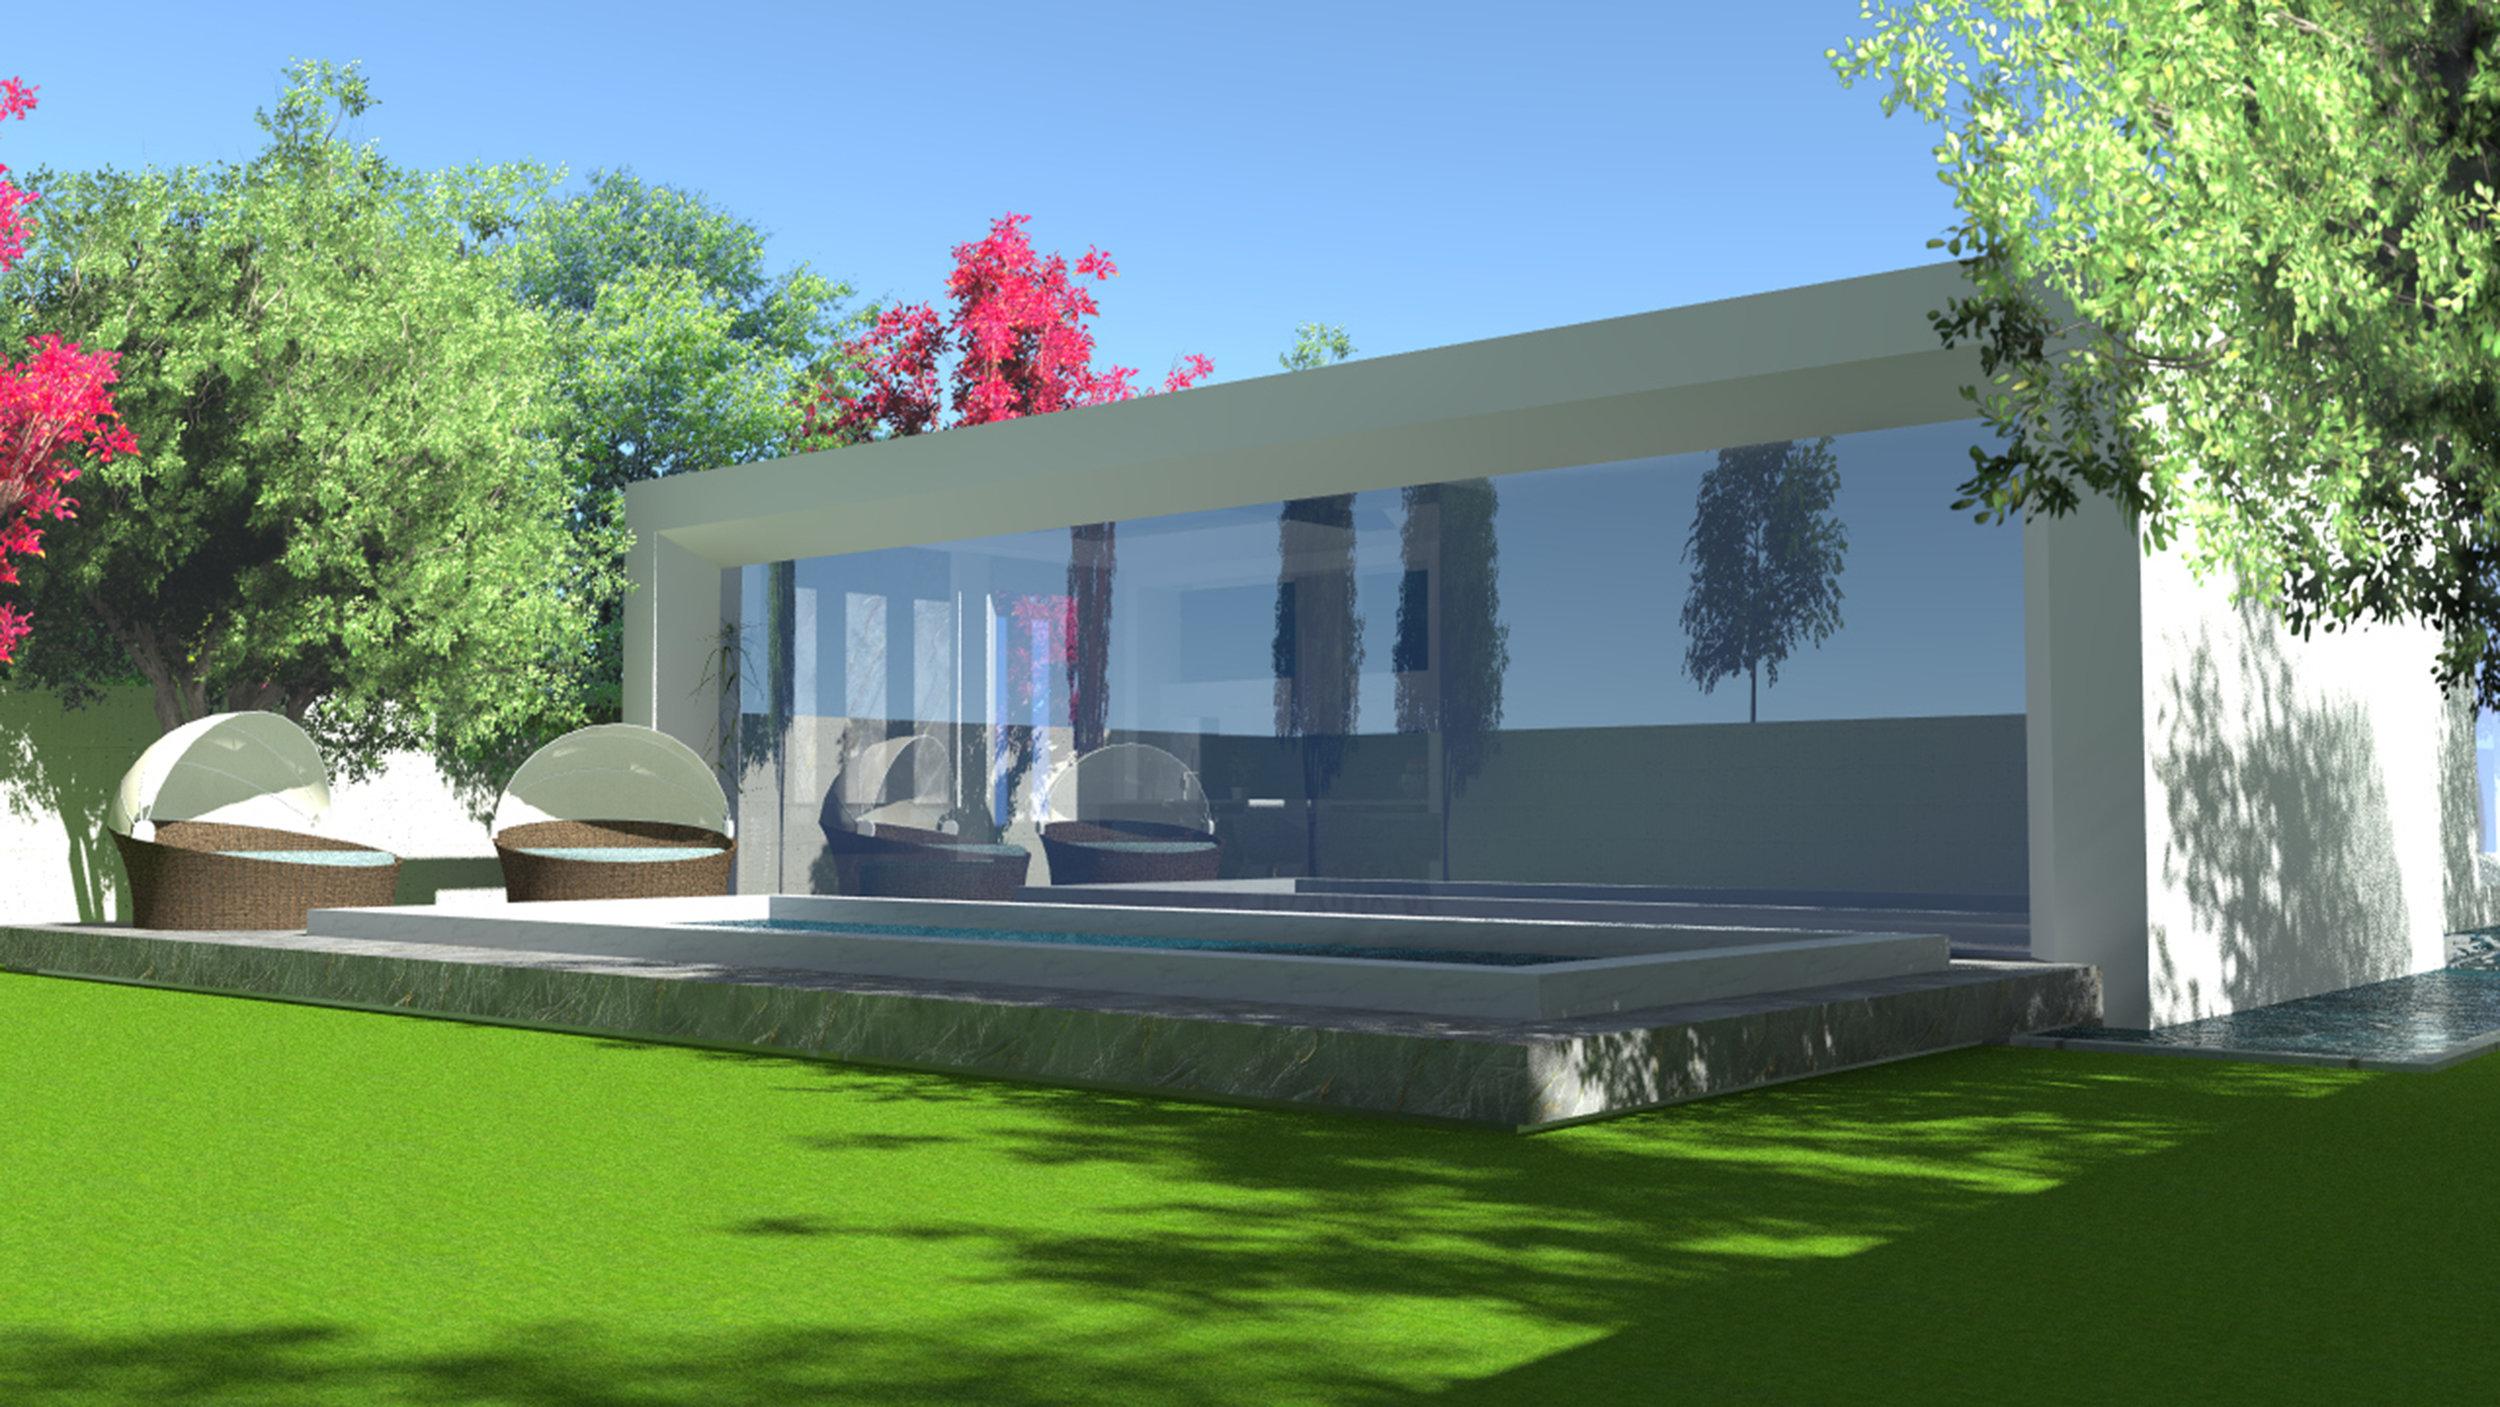 Suburban Home - Exterior 2.jpg